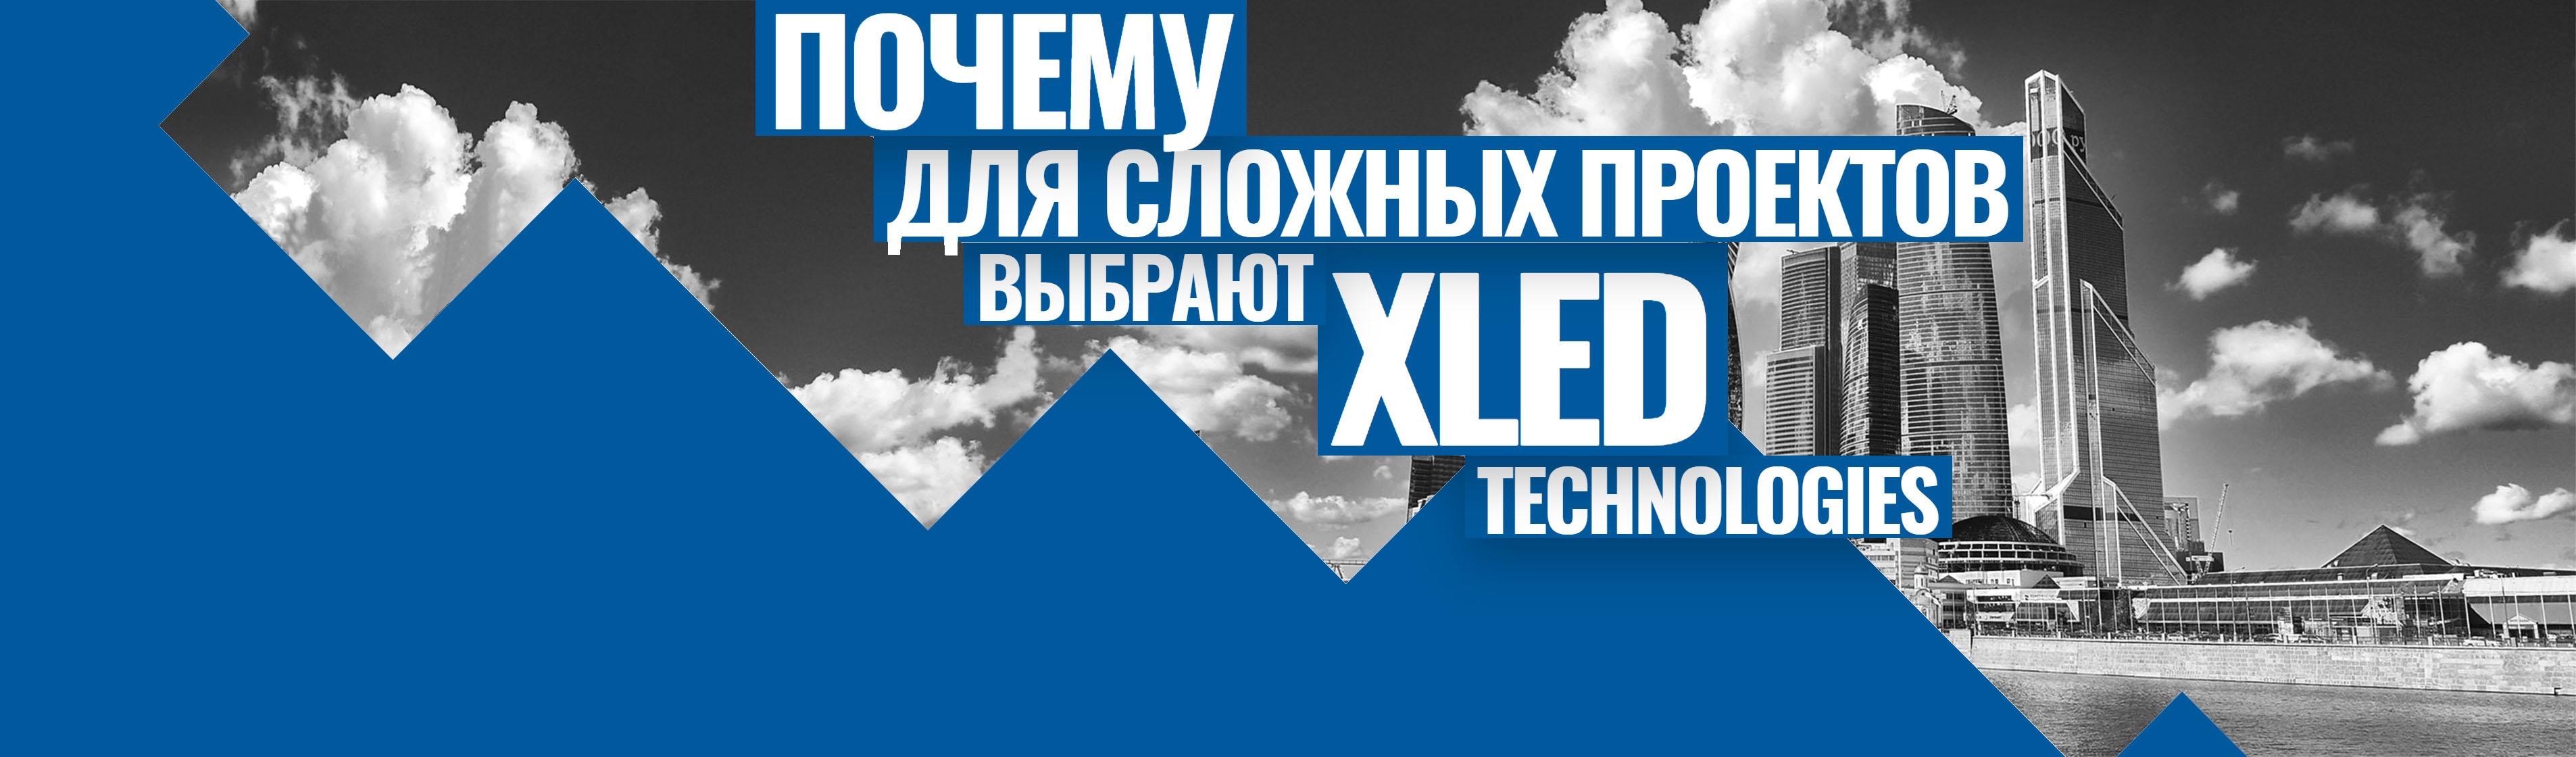 https://www.xled.ru/sites/default/files/revslider/image/About%20Us%20Main.jpg